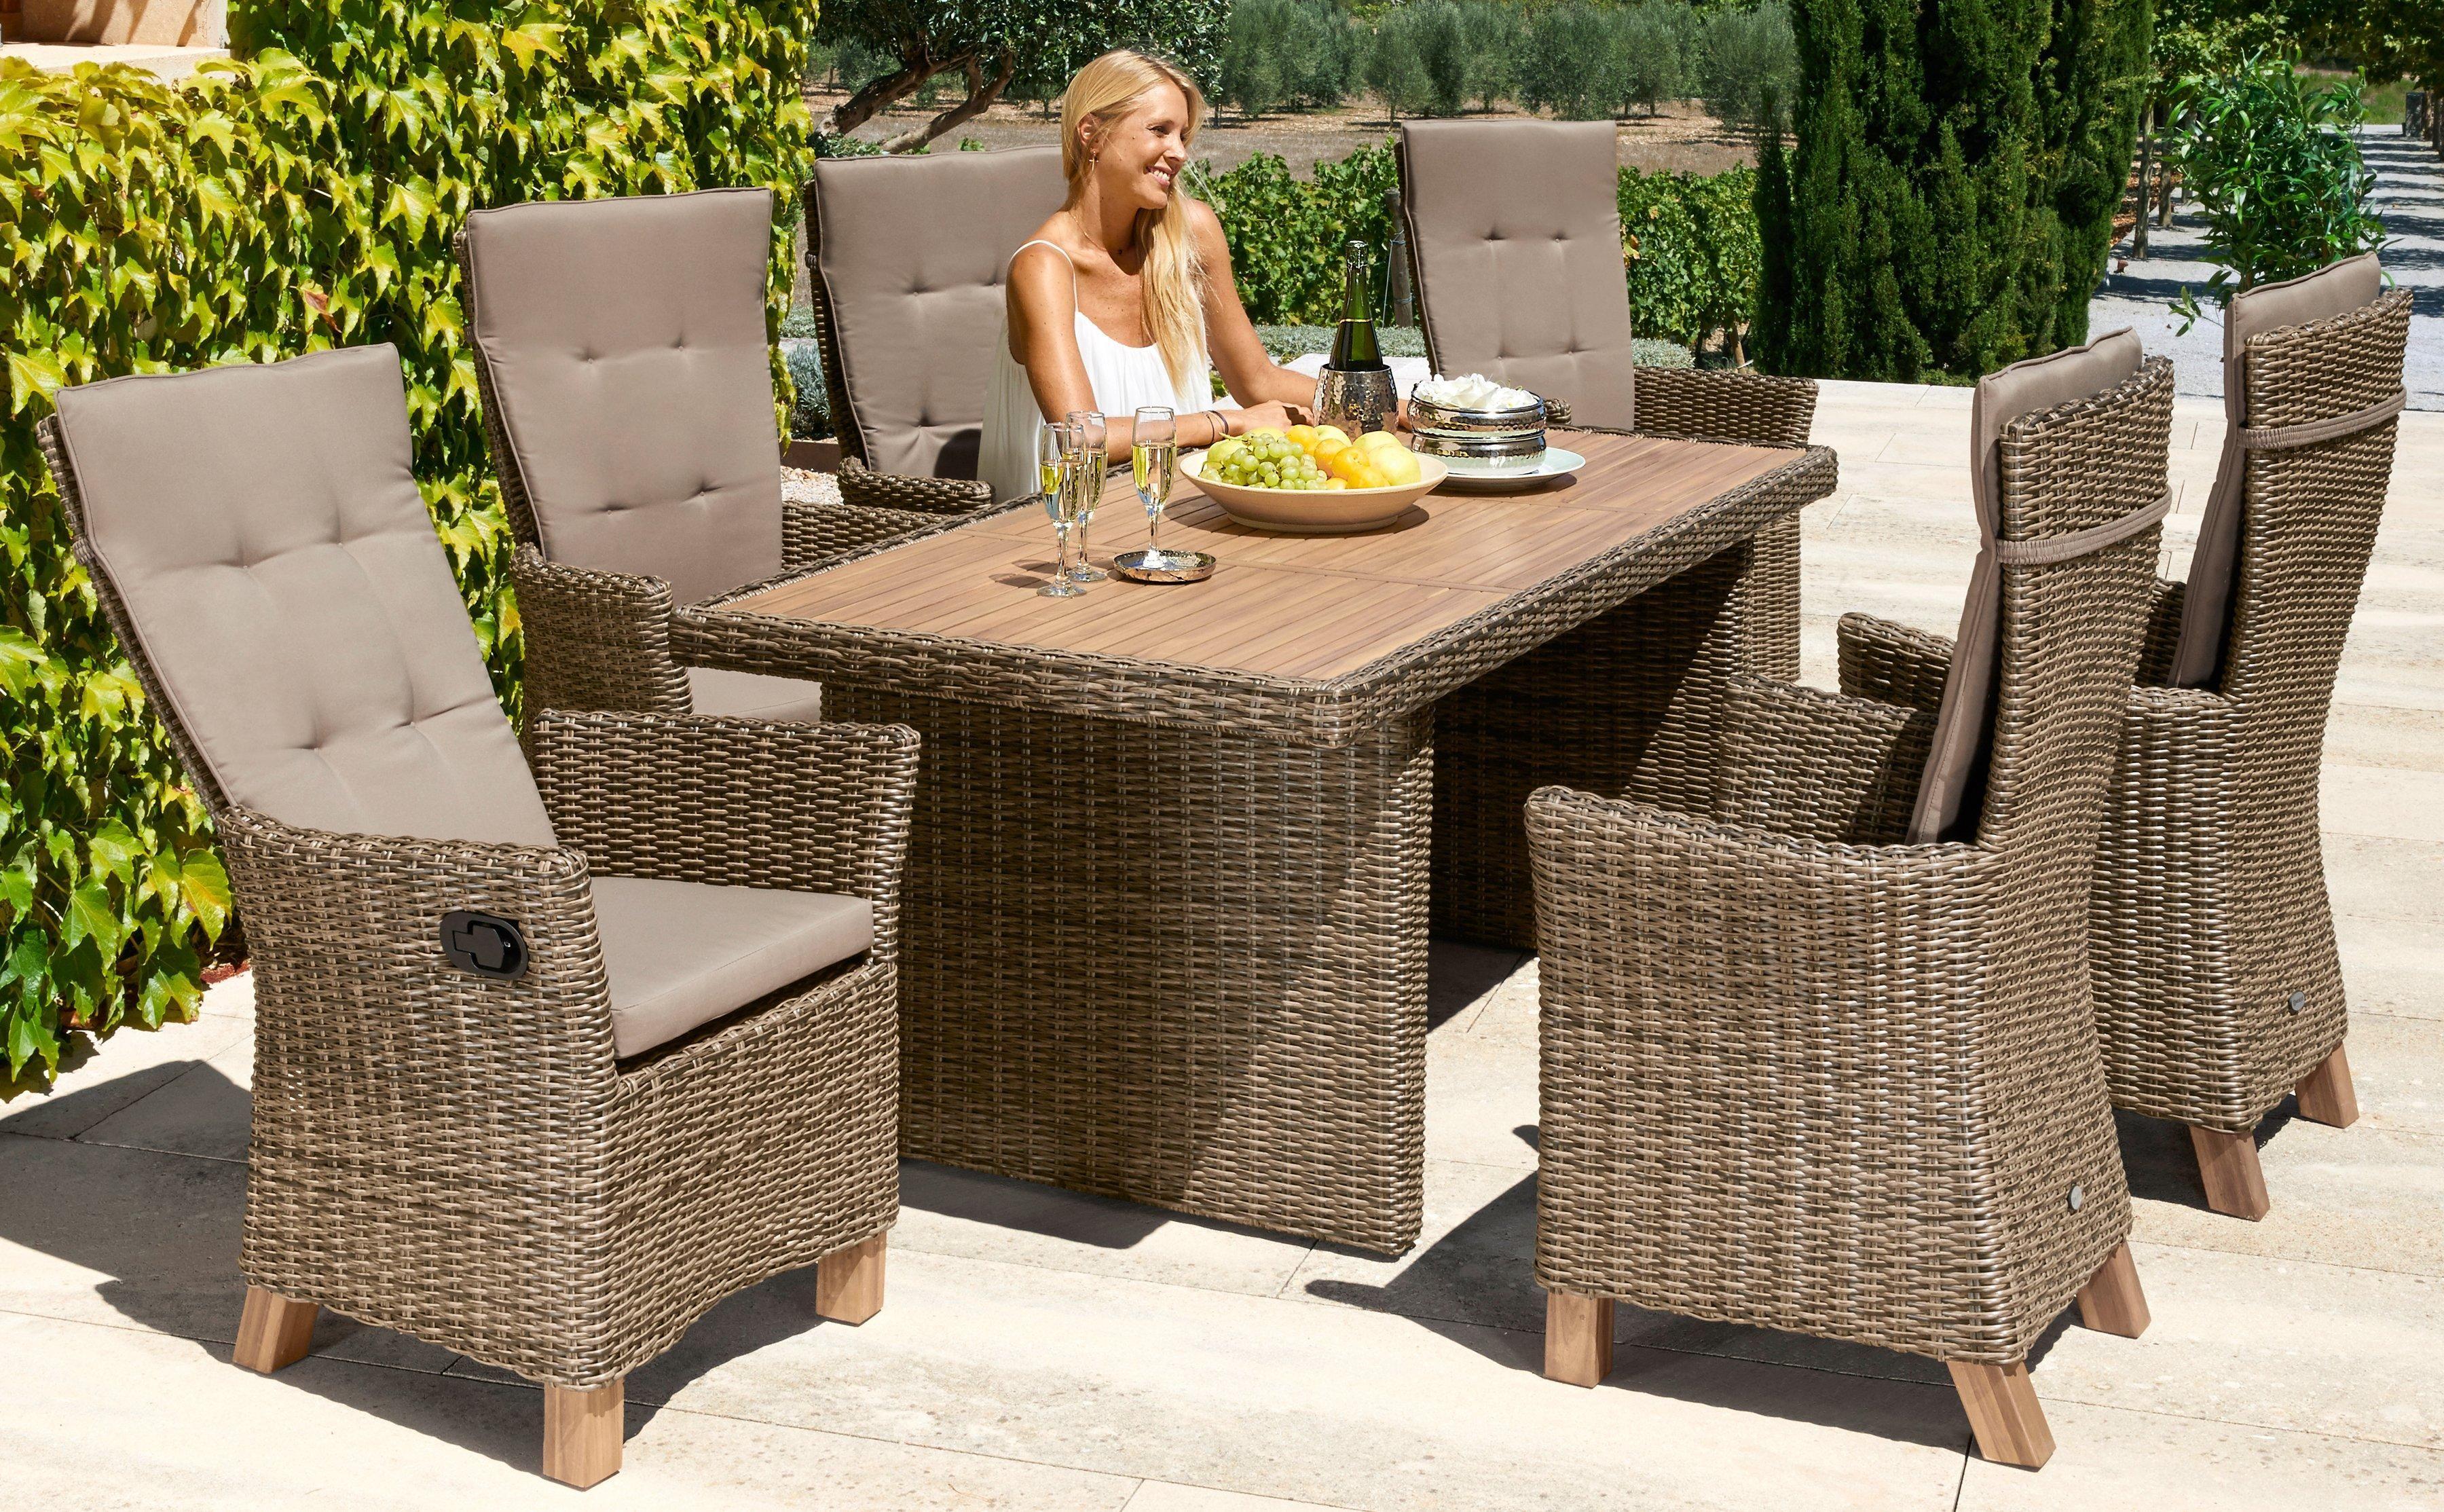 Merxx Gartenmobelset Toskana Deluxe 13 Tlg 6 Sessel Tisch 185x90 Cm Polyrattan Akazie Gartenmobel Polyrattan Gartenmobel Mobel